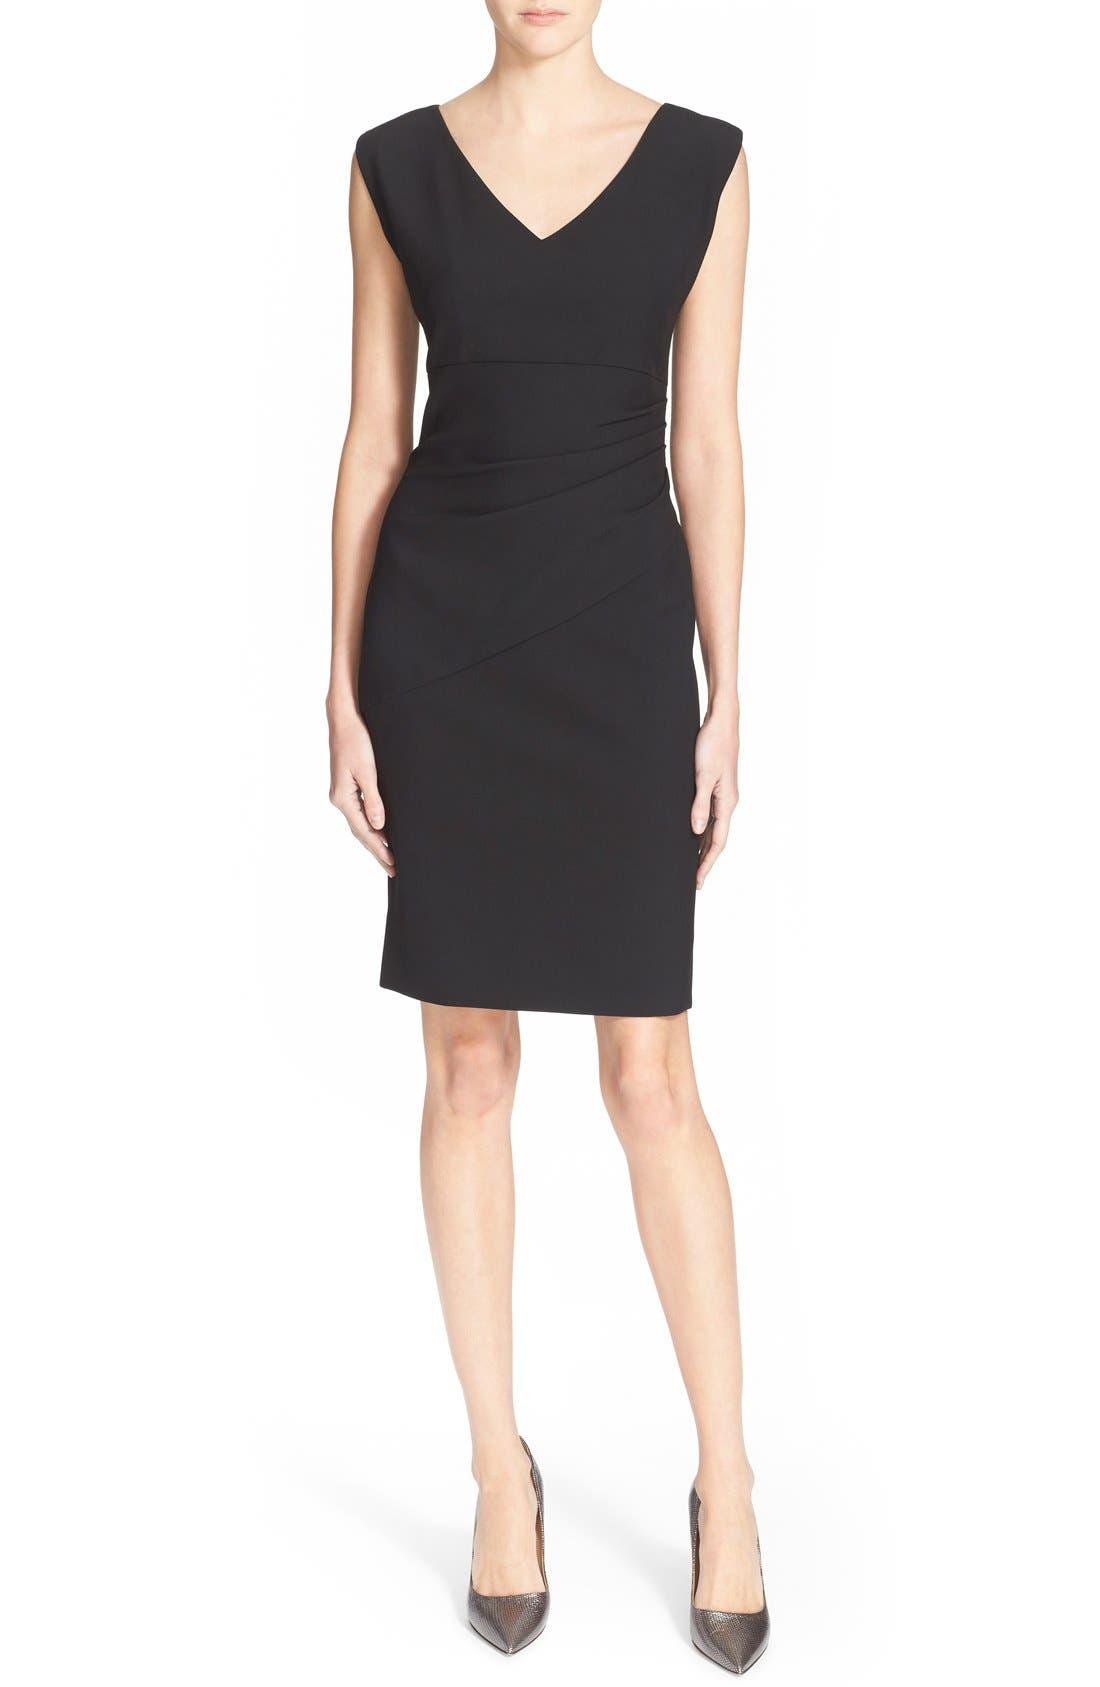 Alternate Image 1 Selected - Diane von Furstenberg 'Bevin' Sheath Dress